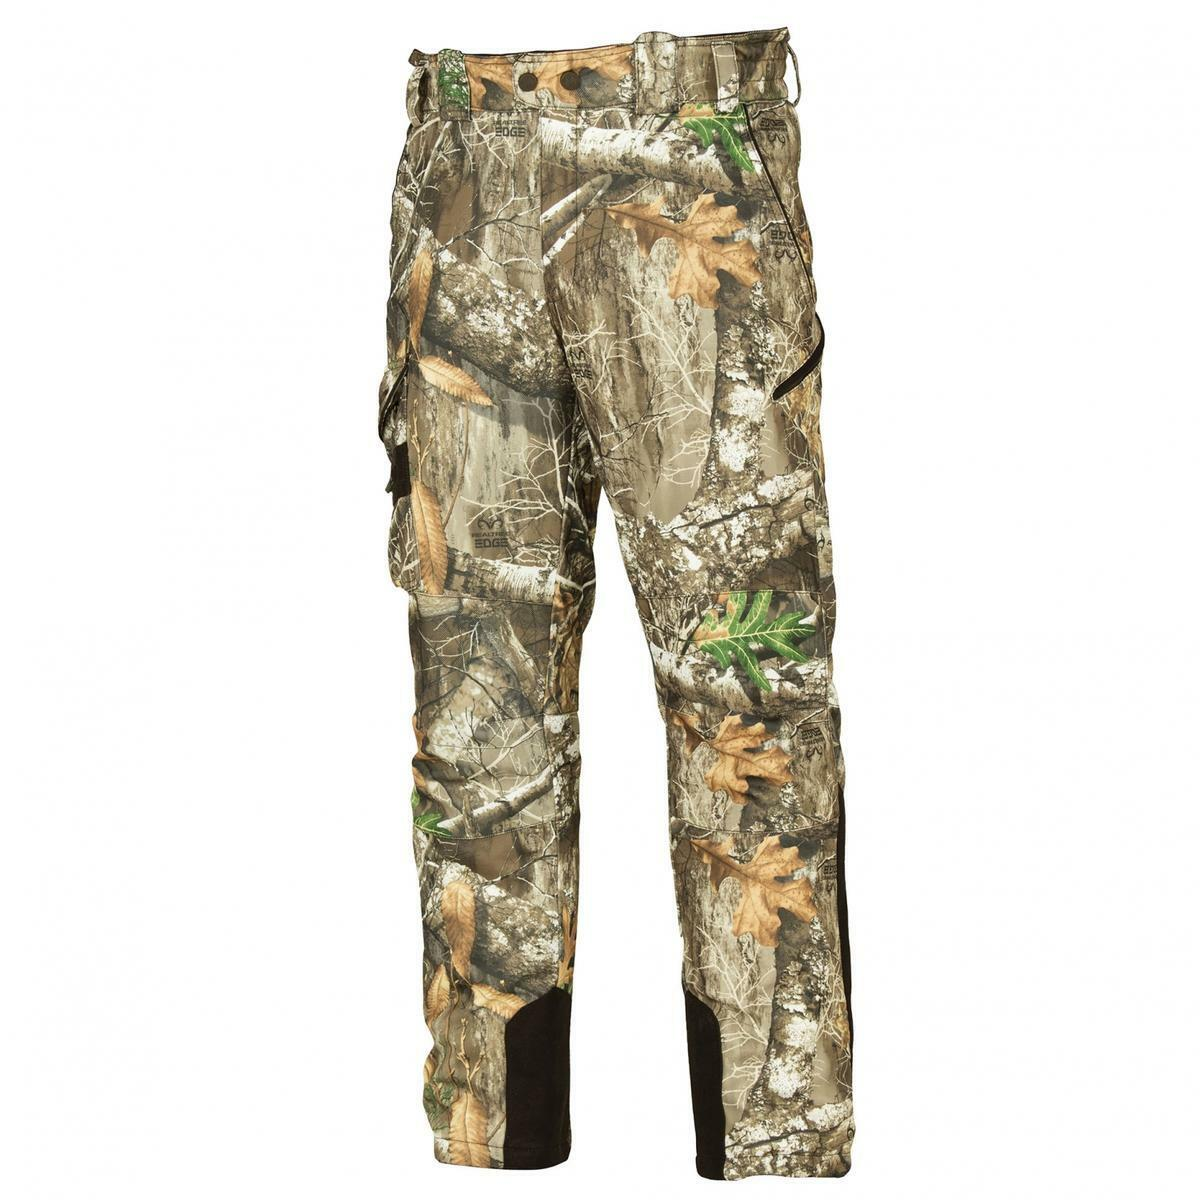 Deerhunter Muflon Pantalon - Edge C50 C50